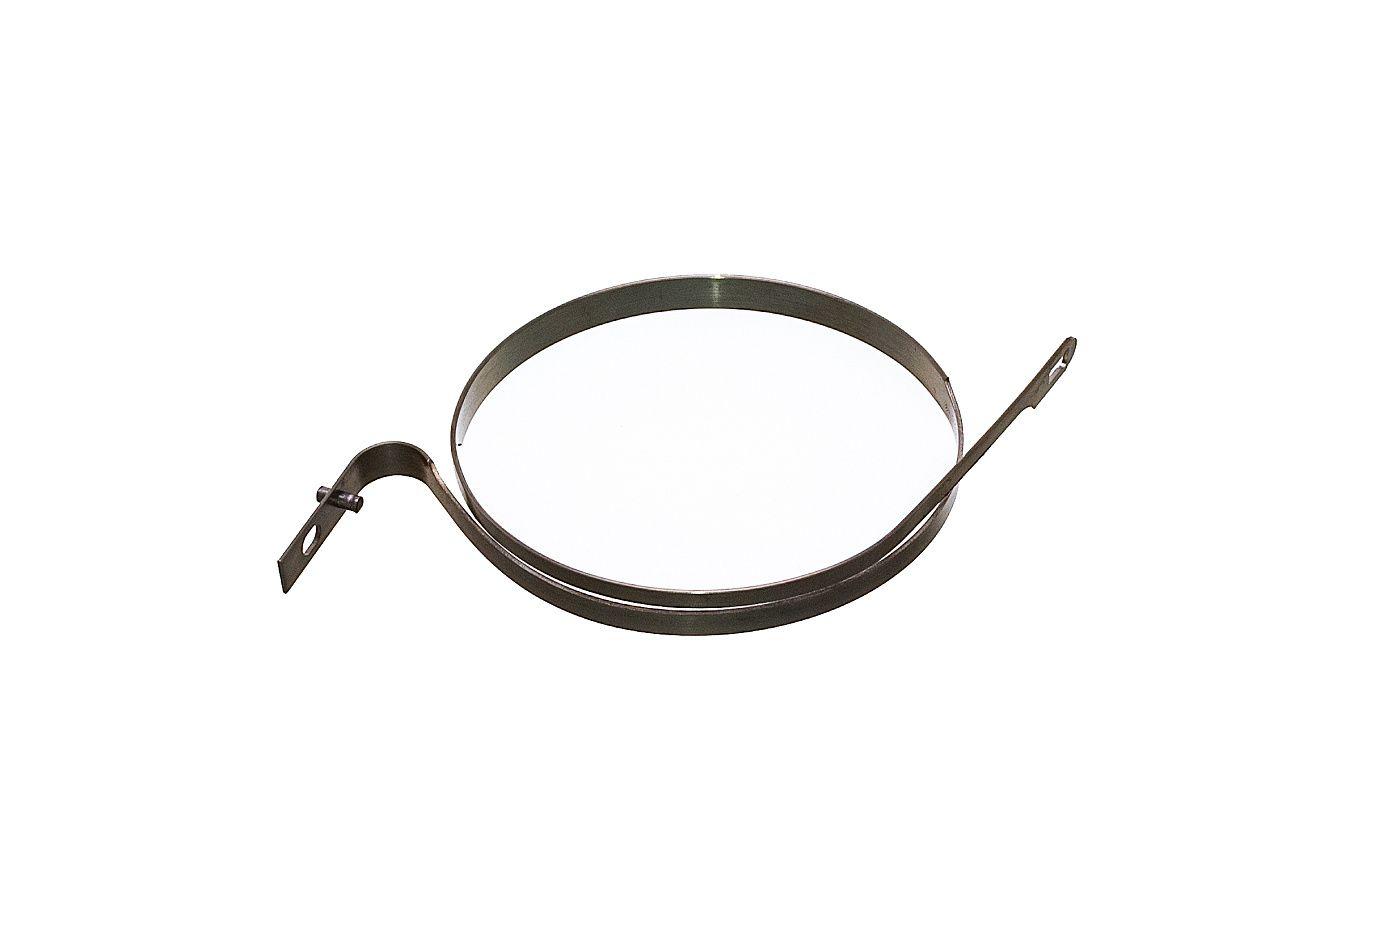 Pás brzdy Stihl MS311 MS341 MS361 MS362 MS391 (1135 160 5400)